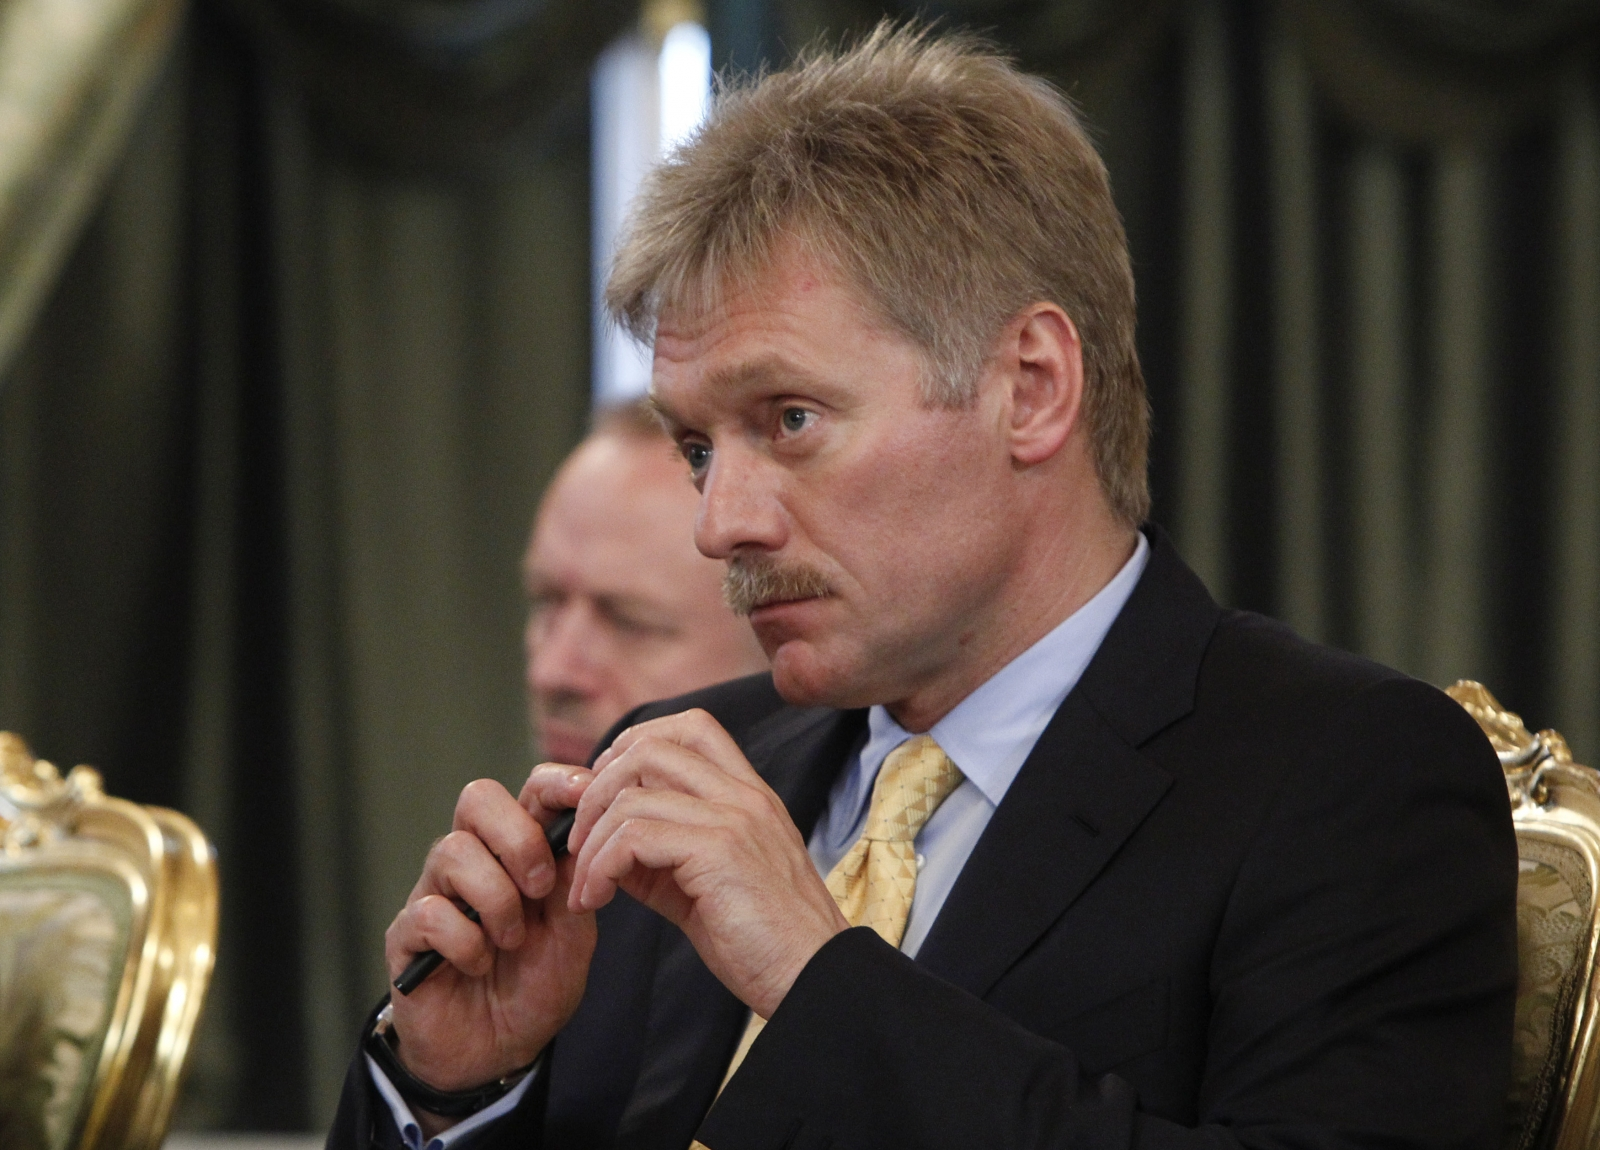 Tatyana Navka and Dmitry Peskov declassified their novel on 01.12.2014 82